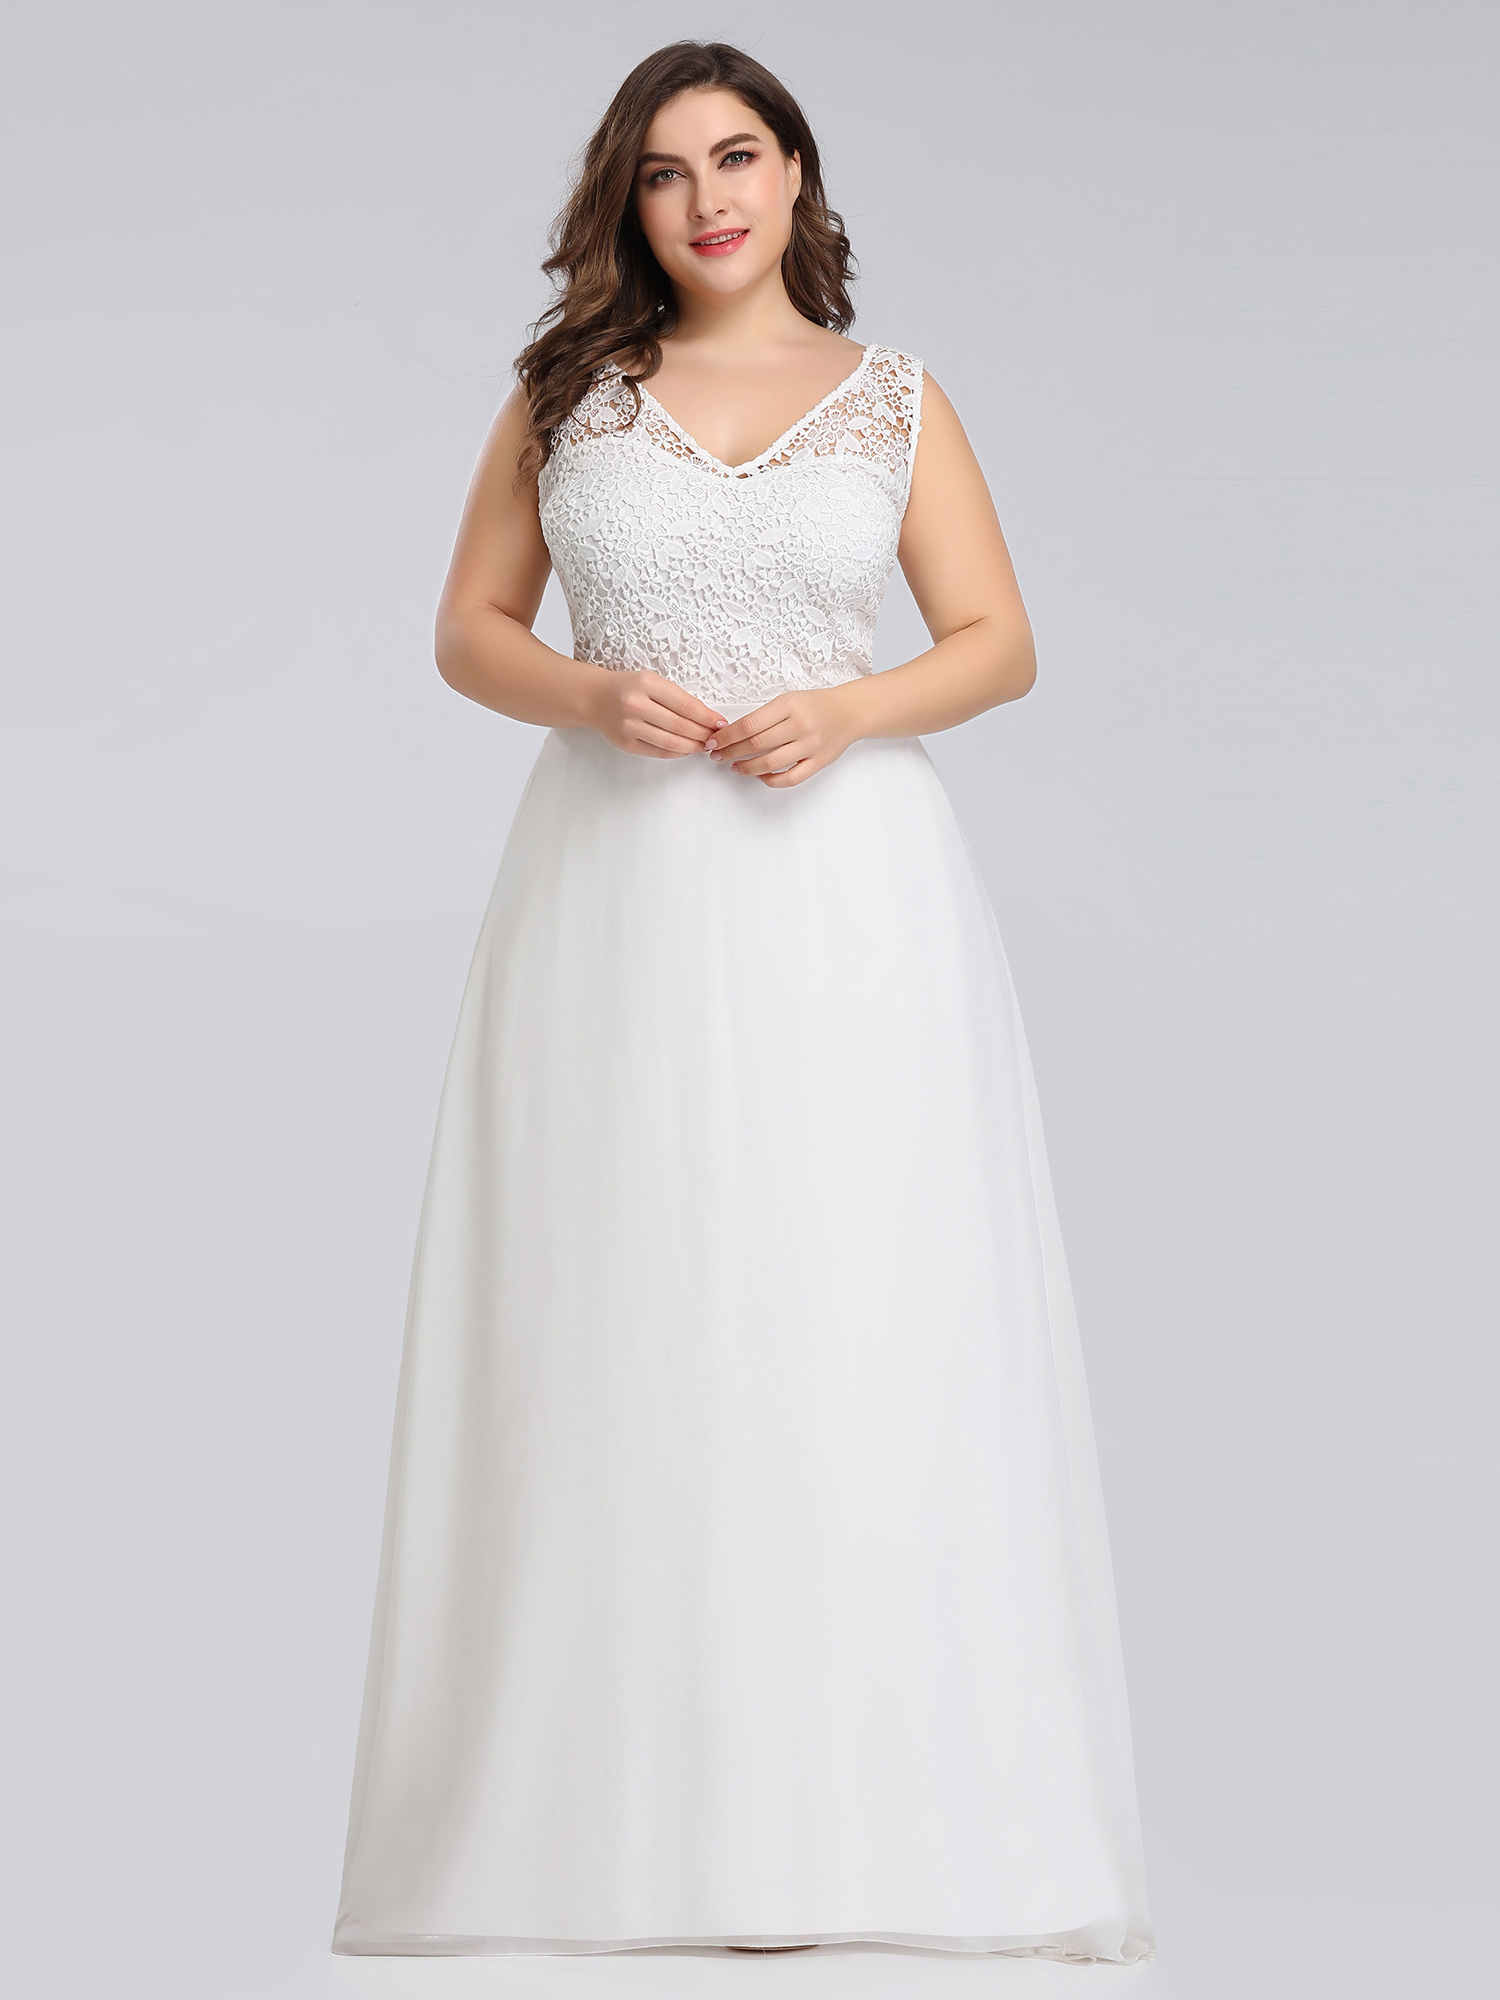 Ever Pretty Us Plus Size Wedding Dress Long V Neck Lace Bridesmaid Gowns 07686 Ebay,Beach Wedding Guest Dresses 2020